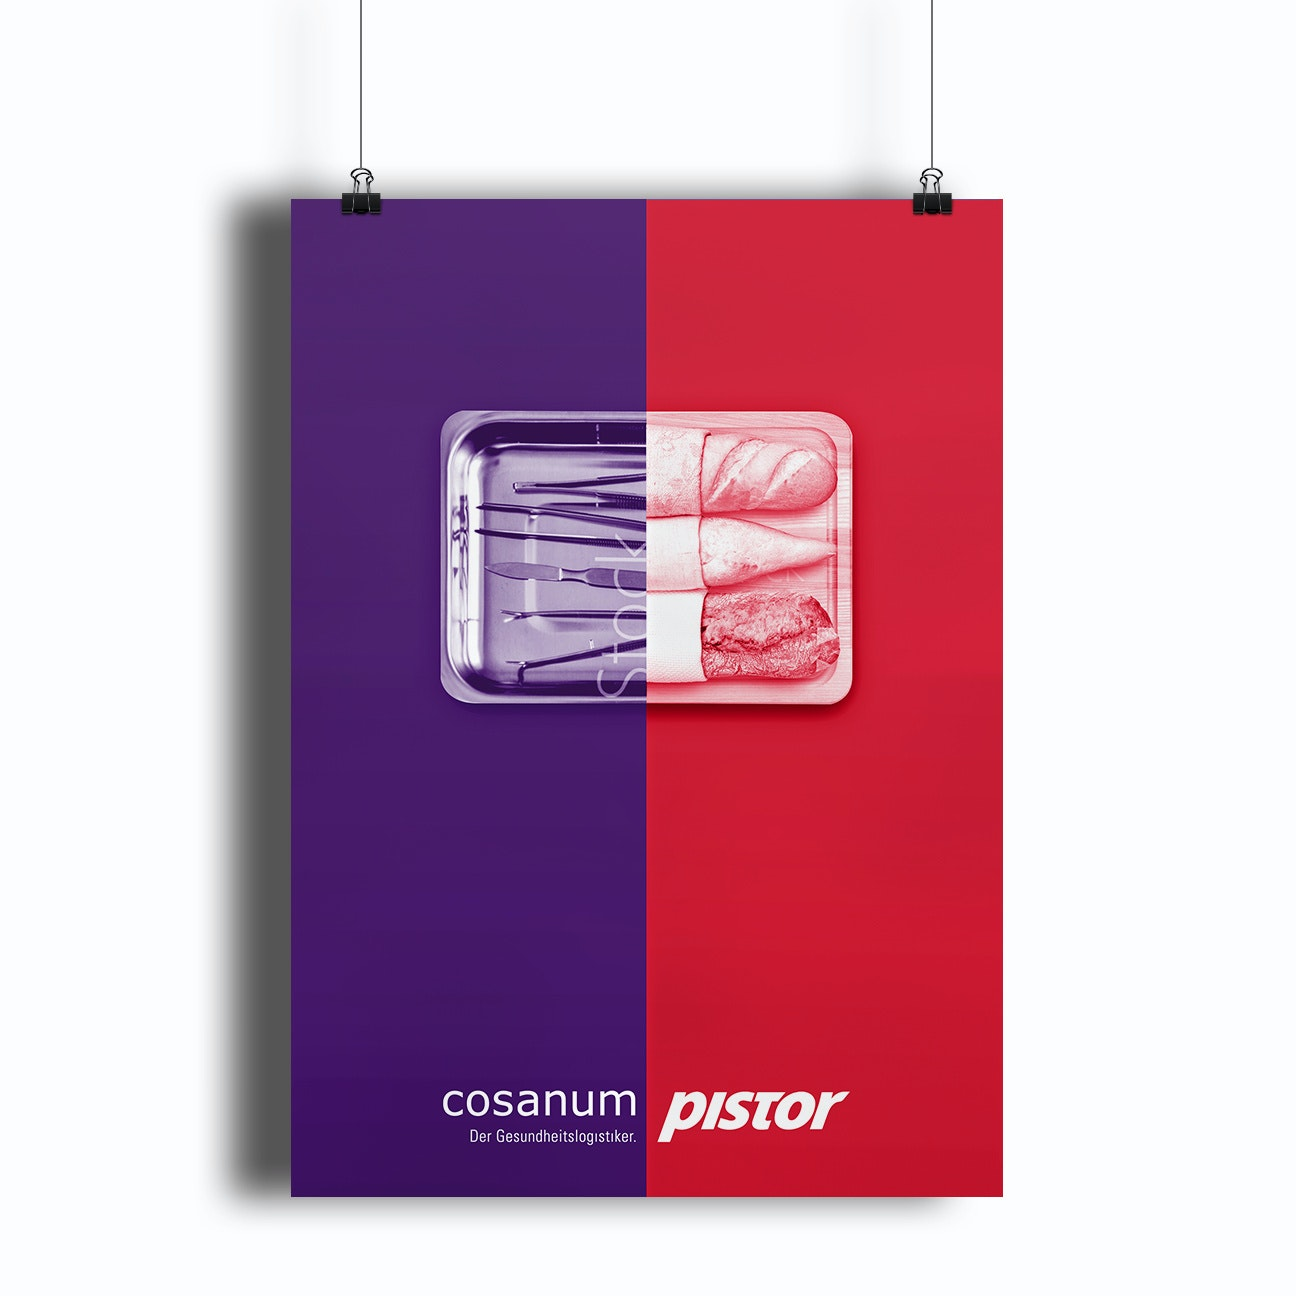 A duotone poster design